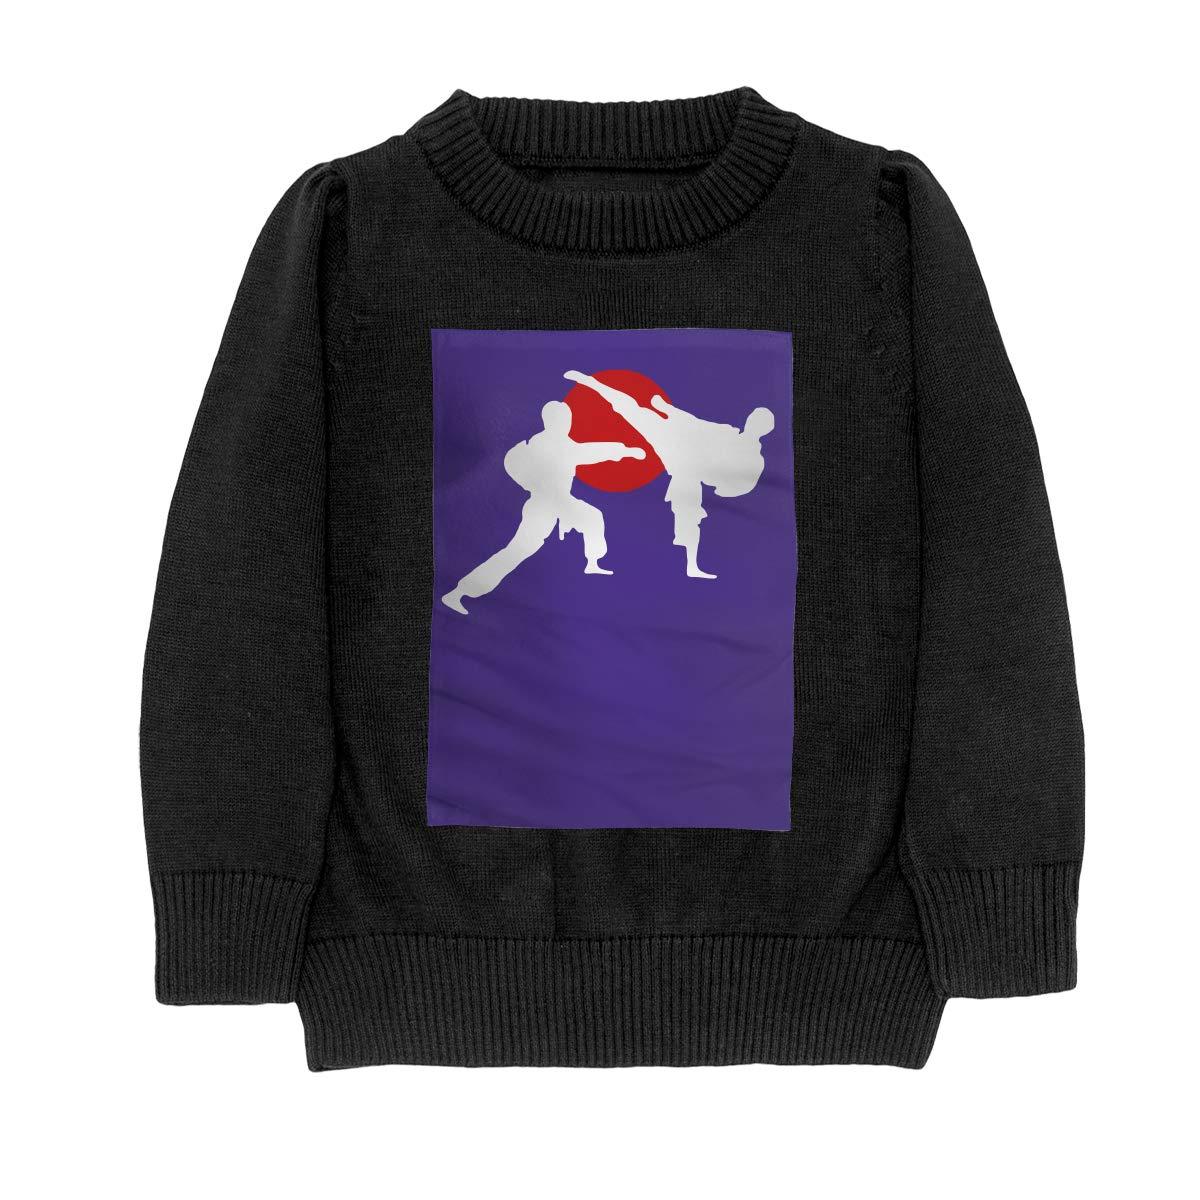 WWTBBJ-B Two Karate Fighter Fashion Teenager Boys Girls Unisex Sweater Keep Warm